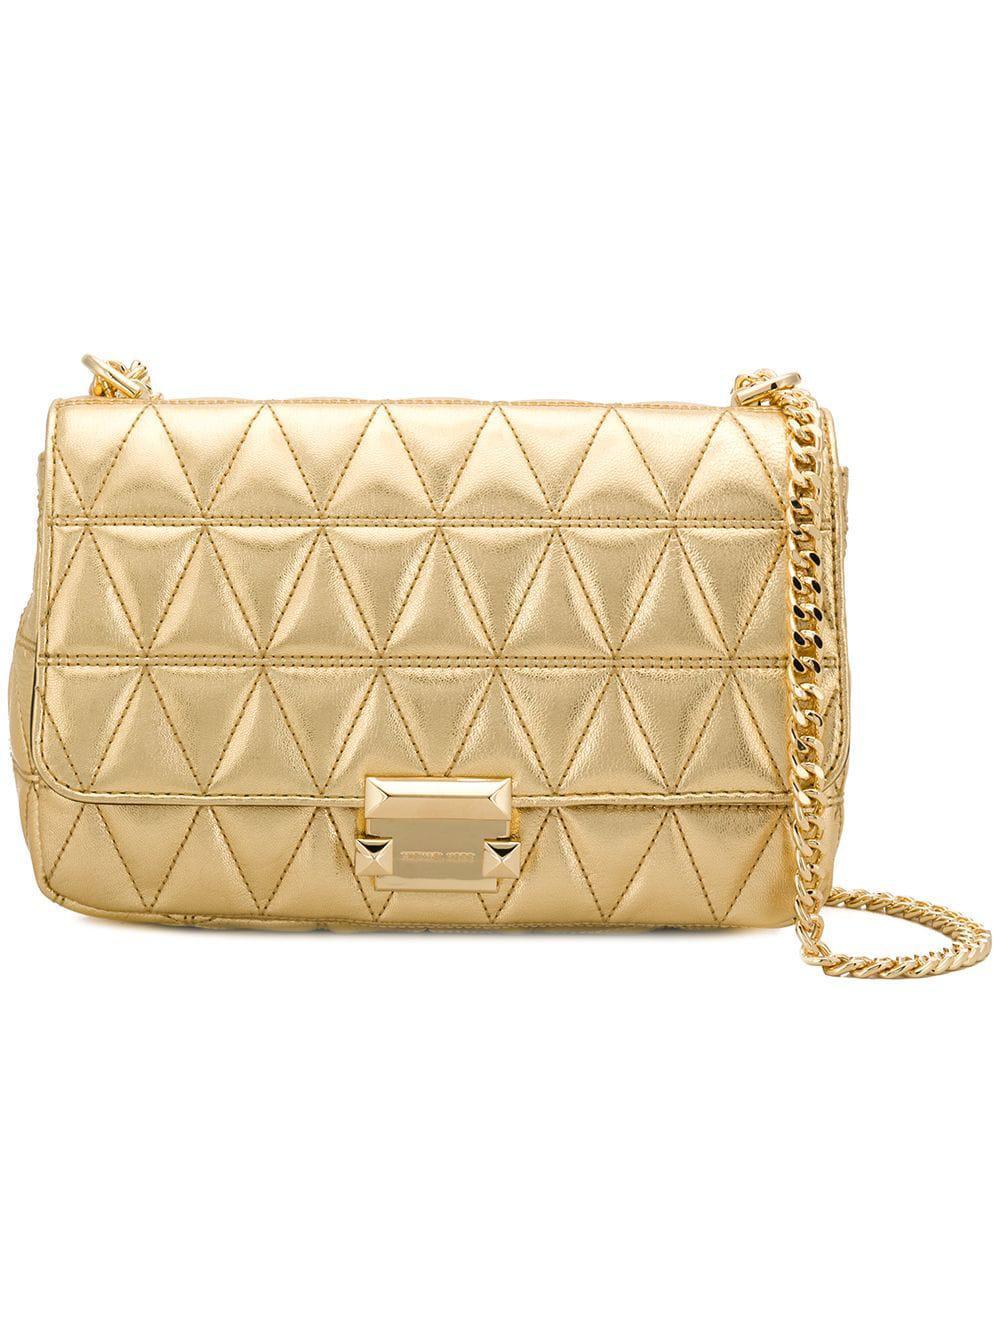 c842697b5bf5 MICHAEL Michael Kors Sloan Leather Shoulder Bag in Metallic - Lyst